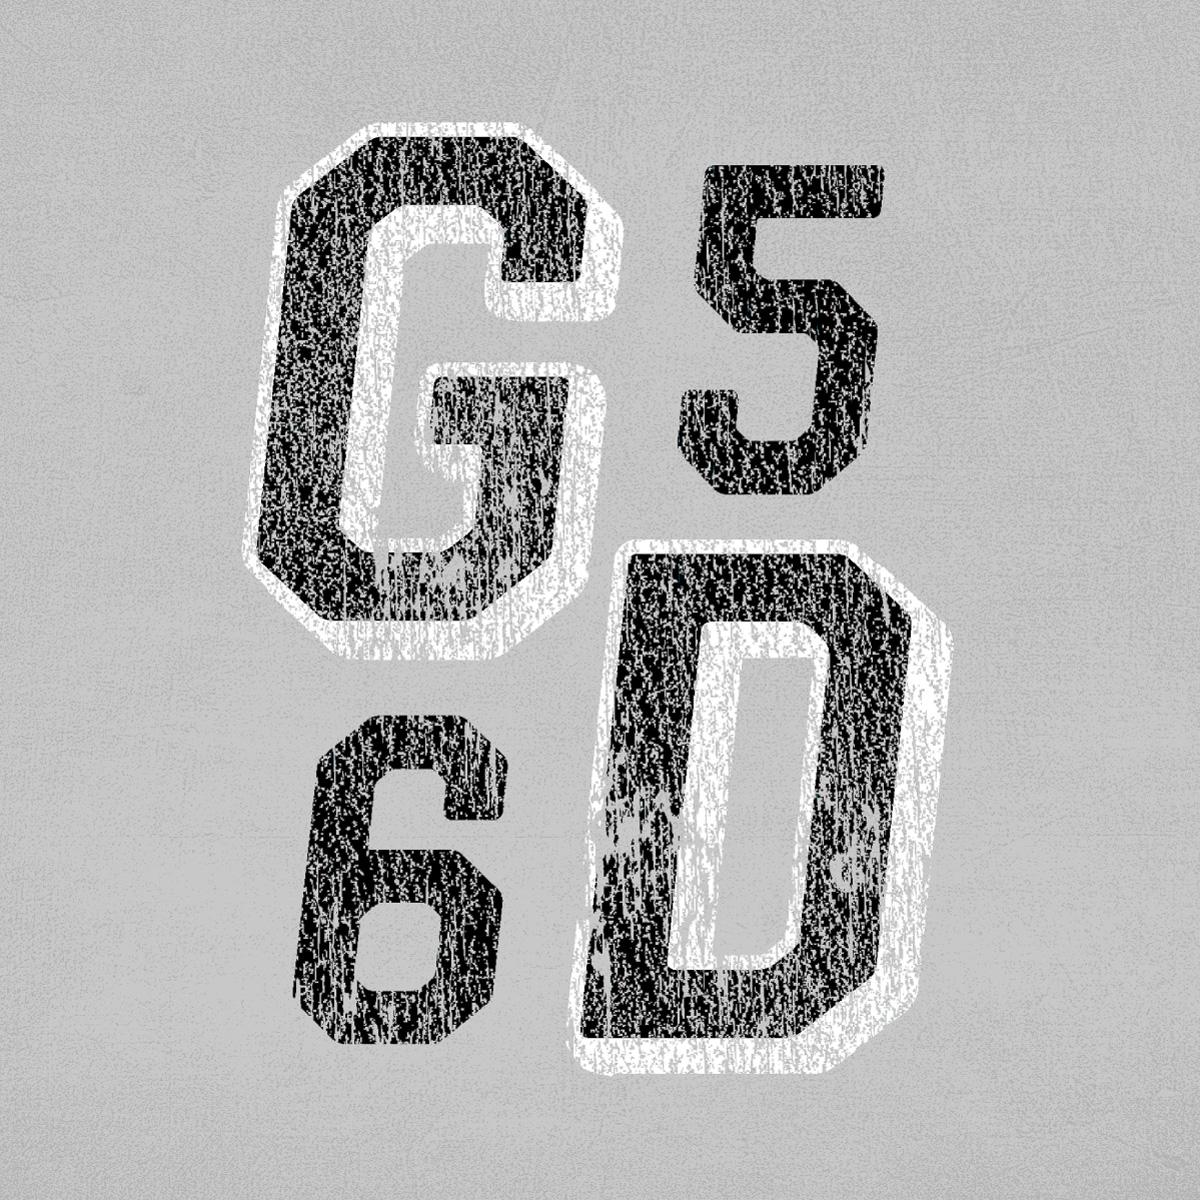 gd-65-Square.jpg